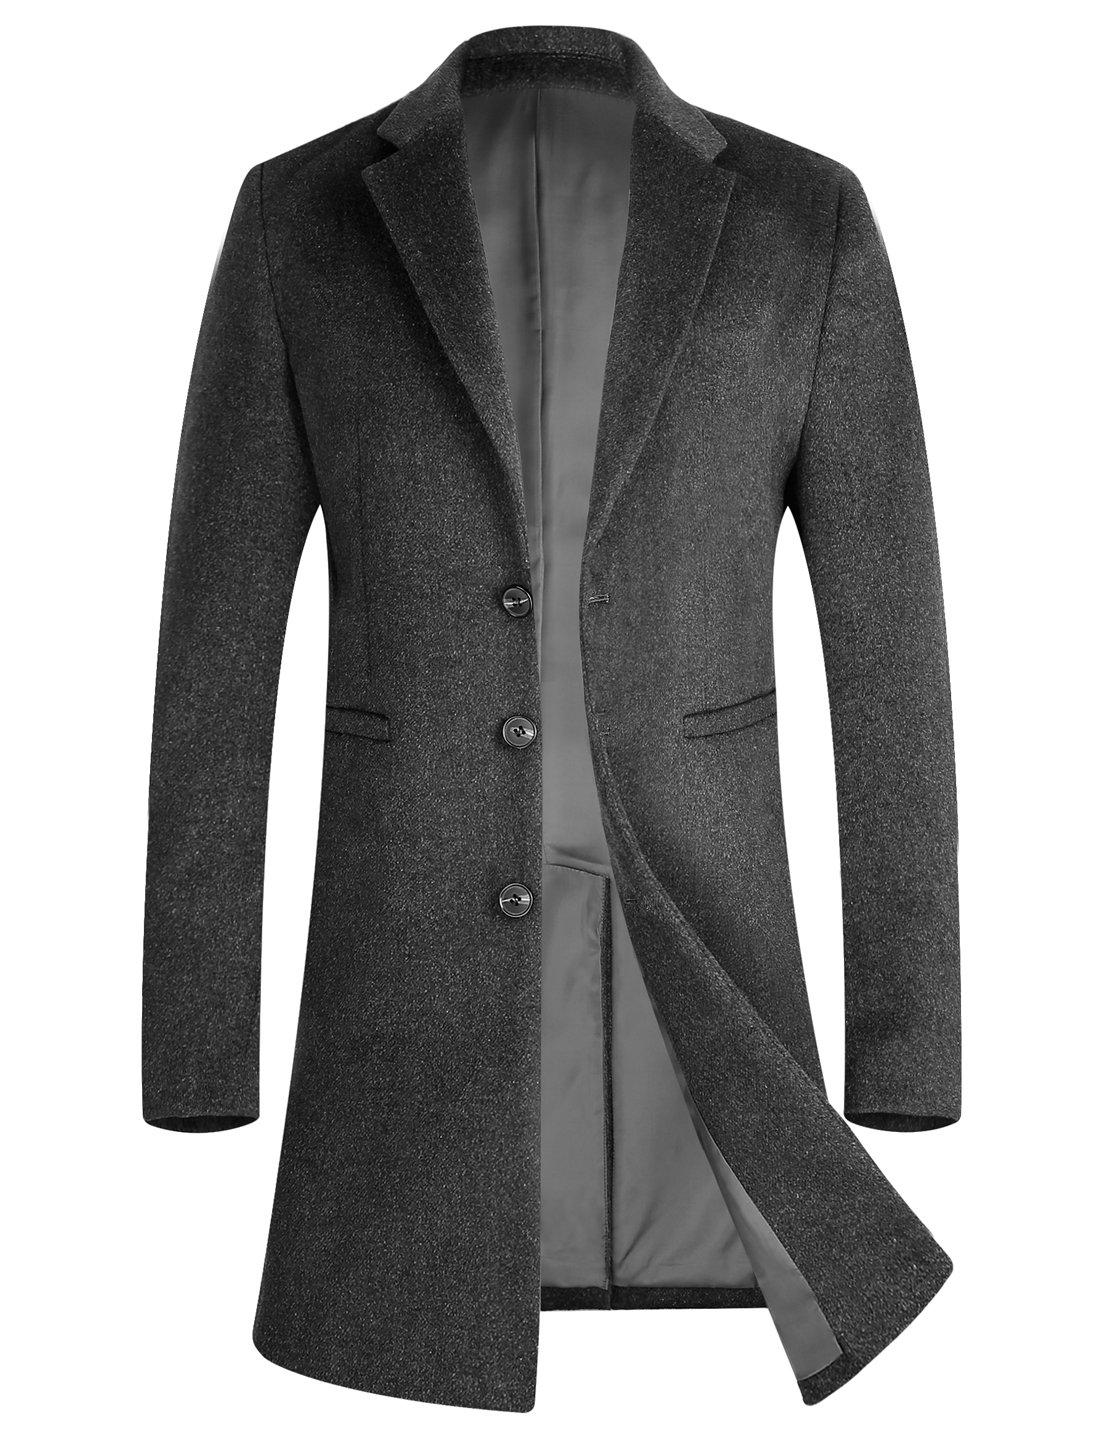 APTRO Men's Wool Coat Long Fashion Slim Fit Overcoat Jacket 1701 DZDY Grey XXL